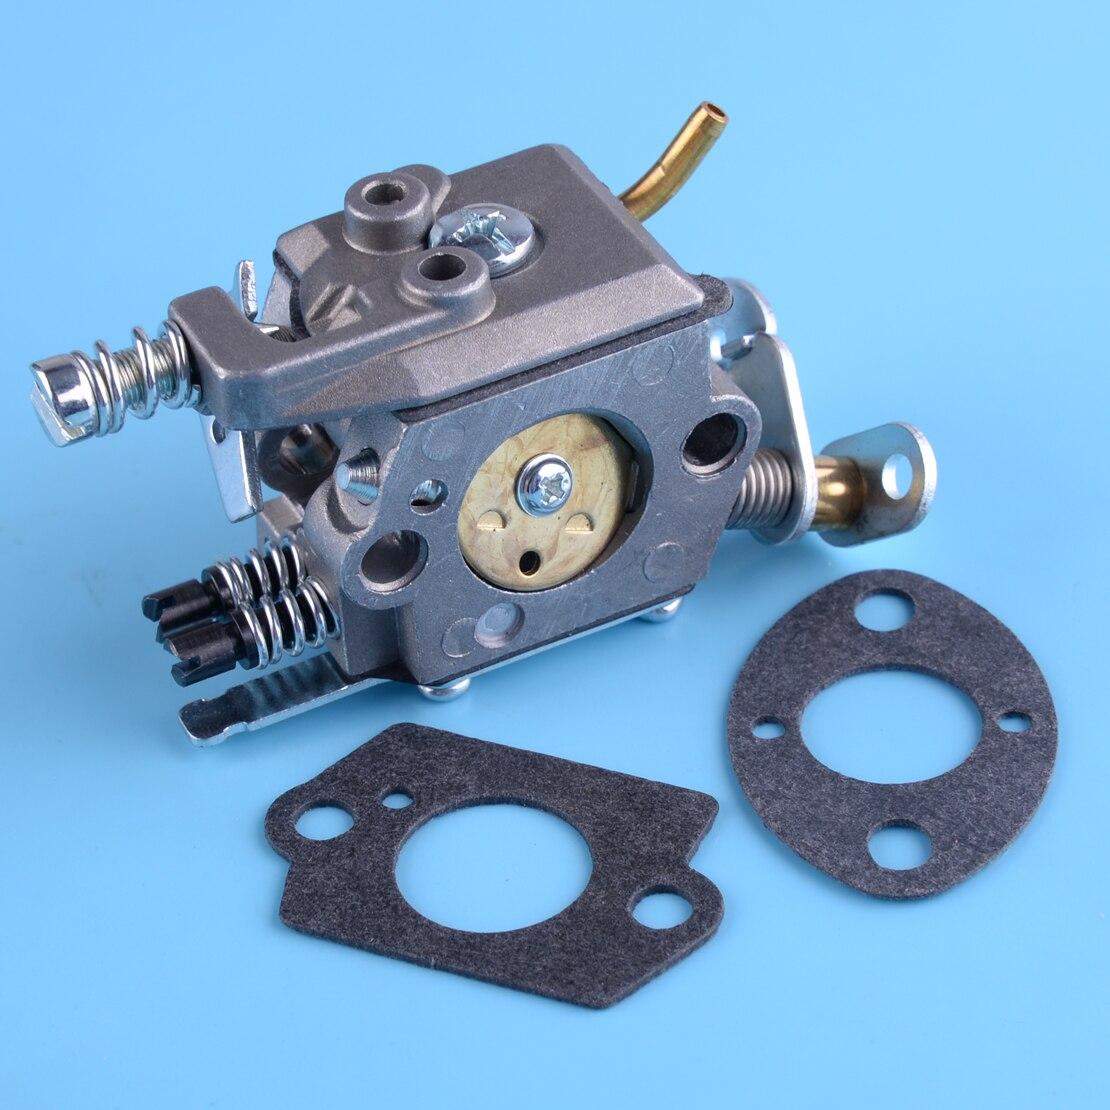 LETAOSK Carburetor Carb Kit Fit For Husqvarna 36 41 136 137 137e 141 142 Chainsaw Zama C1Q-W29E